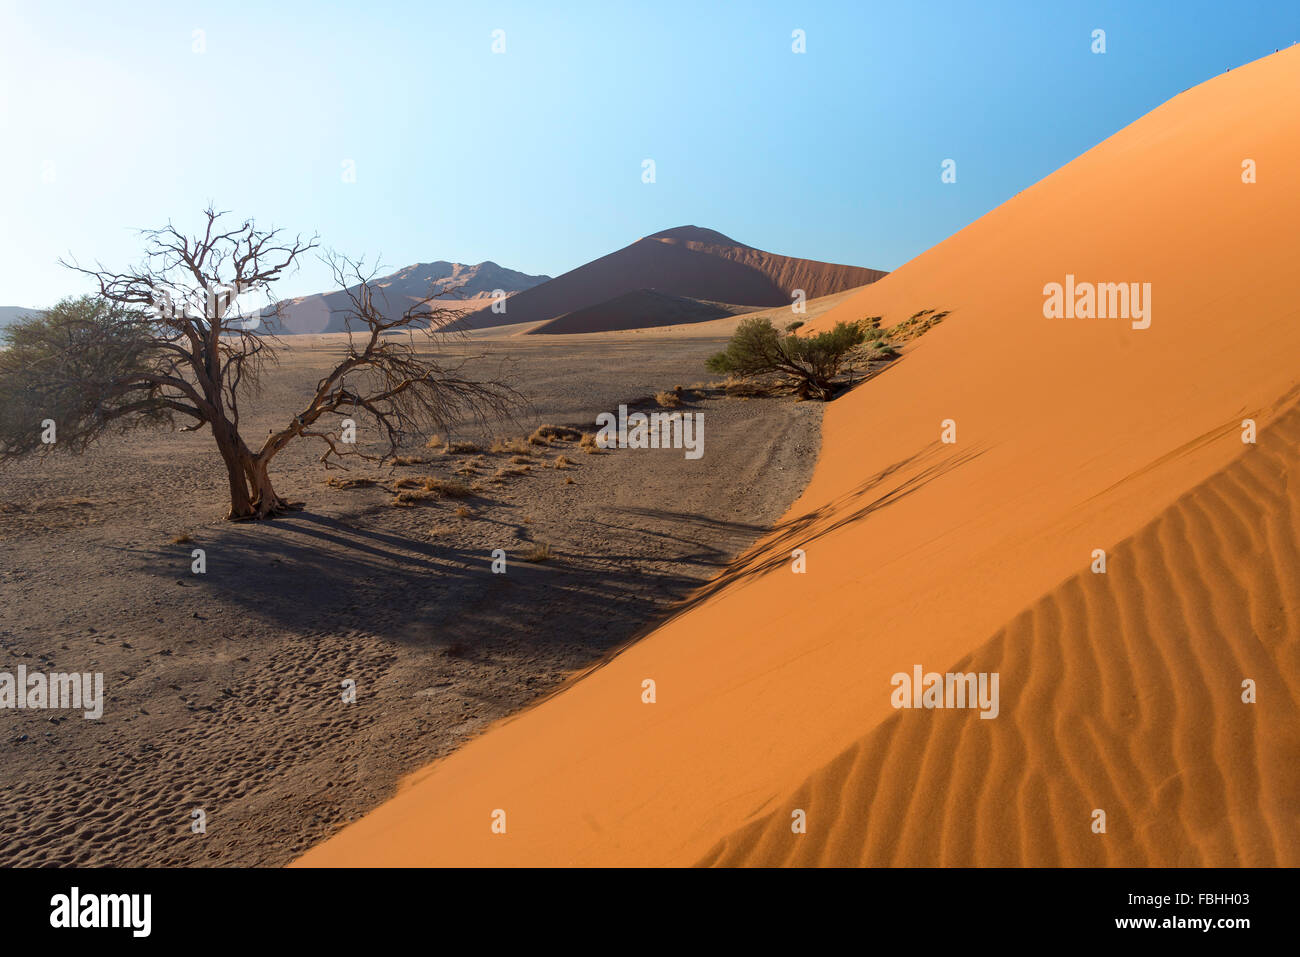 Sand dune, Sossusvlei, Namib Desert, Namib-Naukluft Park, Hardap Region, Republic of Namibia - Stock Image